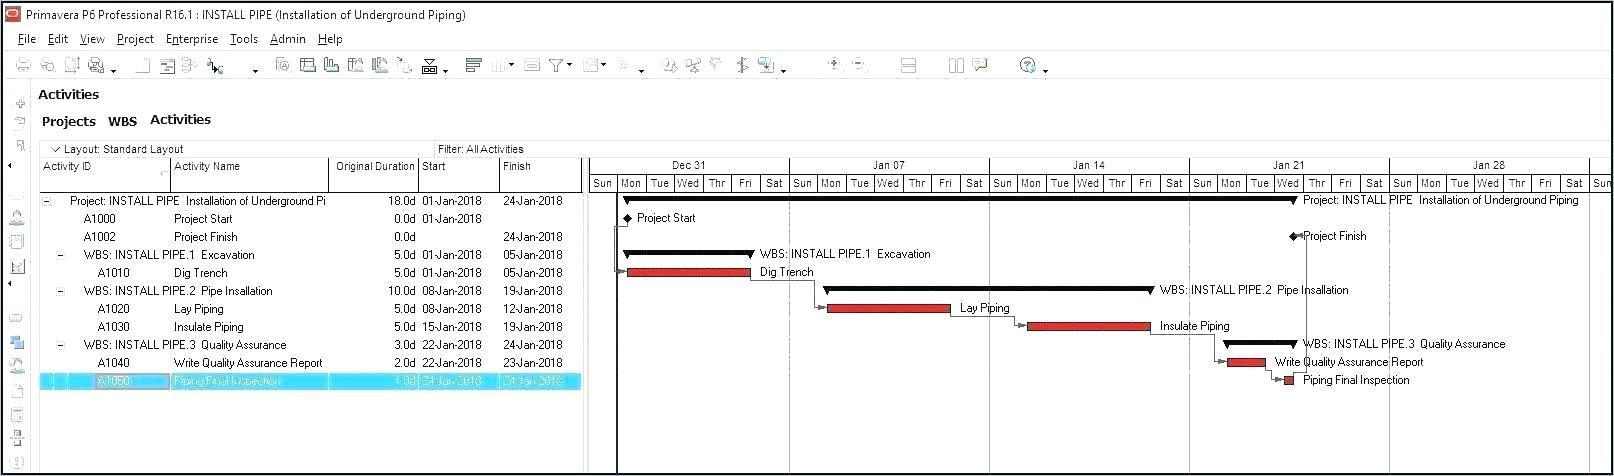 Computer Preventive Maintenance Checklist Template